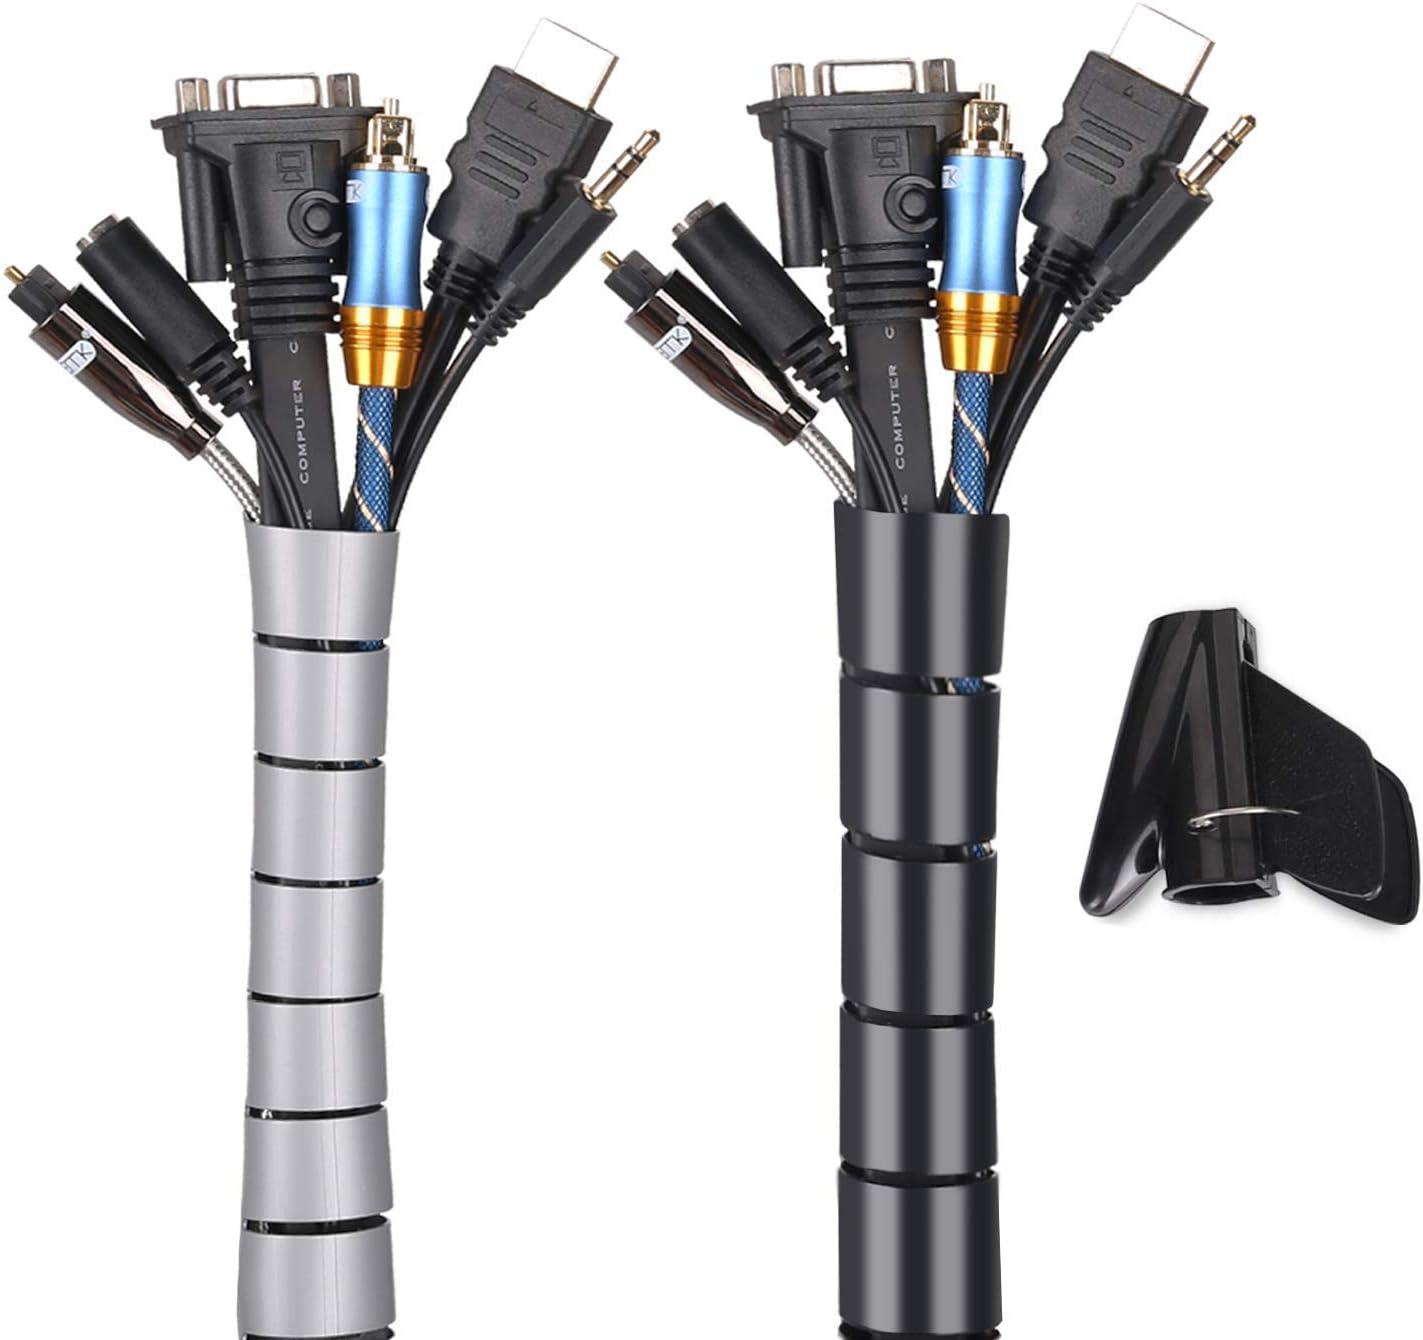 MOSOTECH Organizador Cables, Cubre Cables de 2 x 1.5m, Flexible Funda Organizador Cables, Organizador de Cables Mesa, Recoge Cables para Office y PC ...